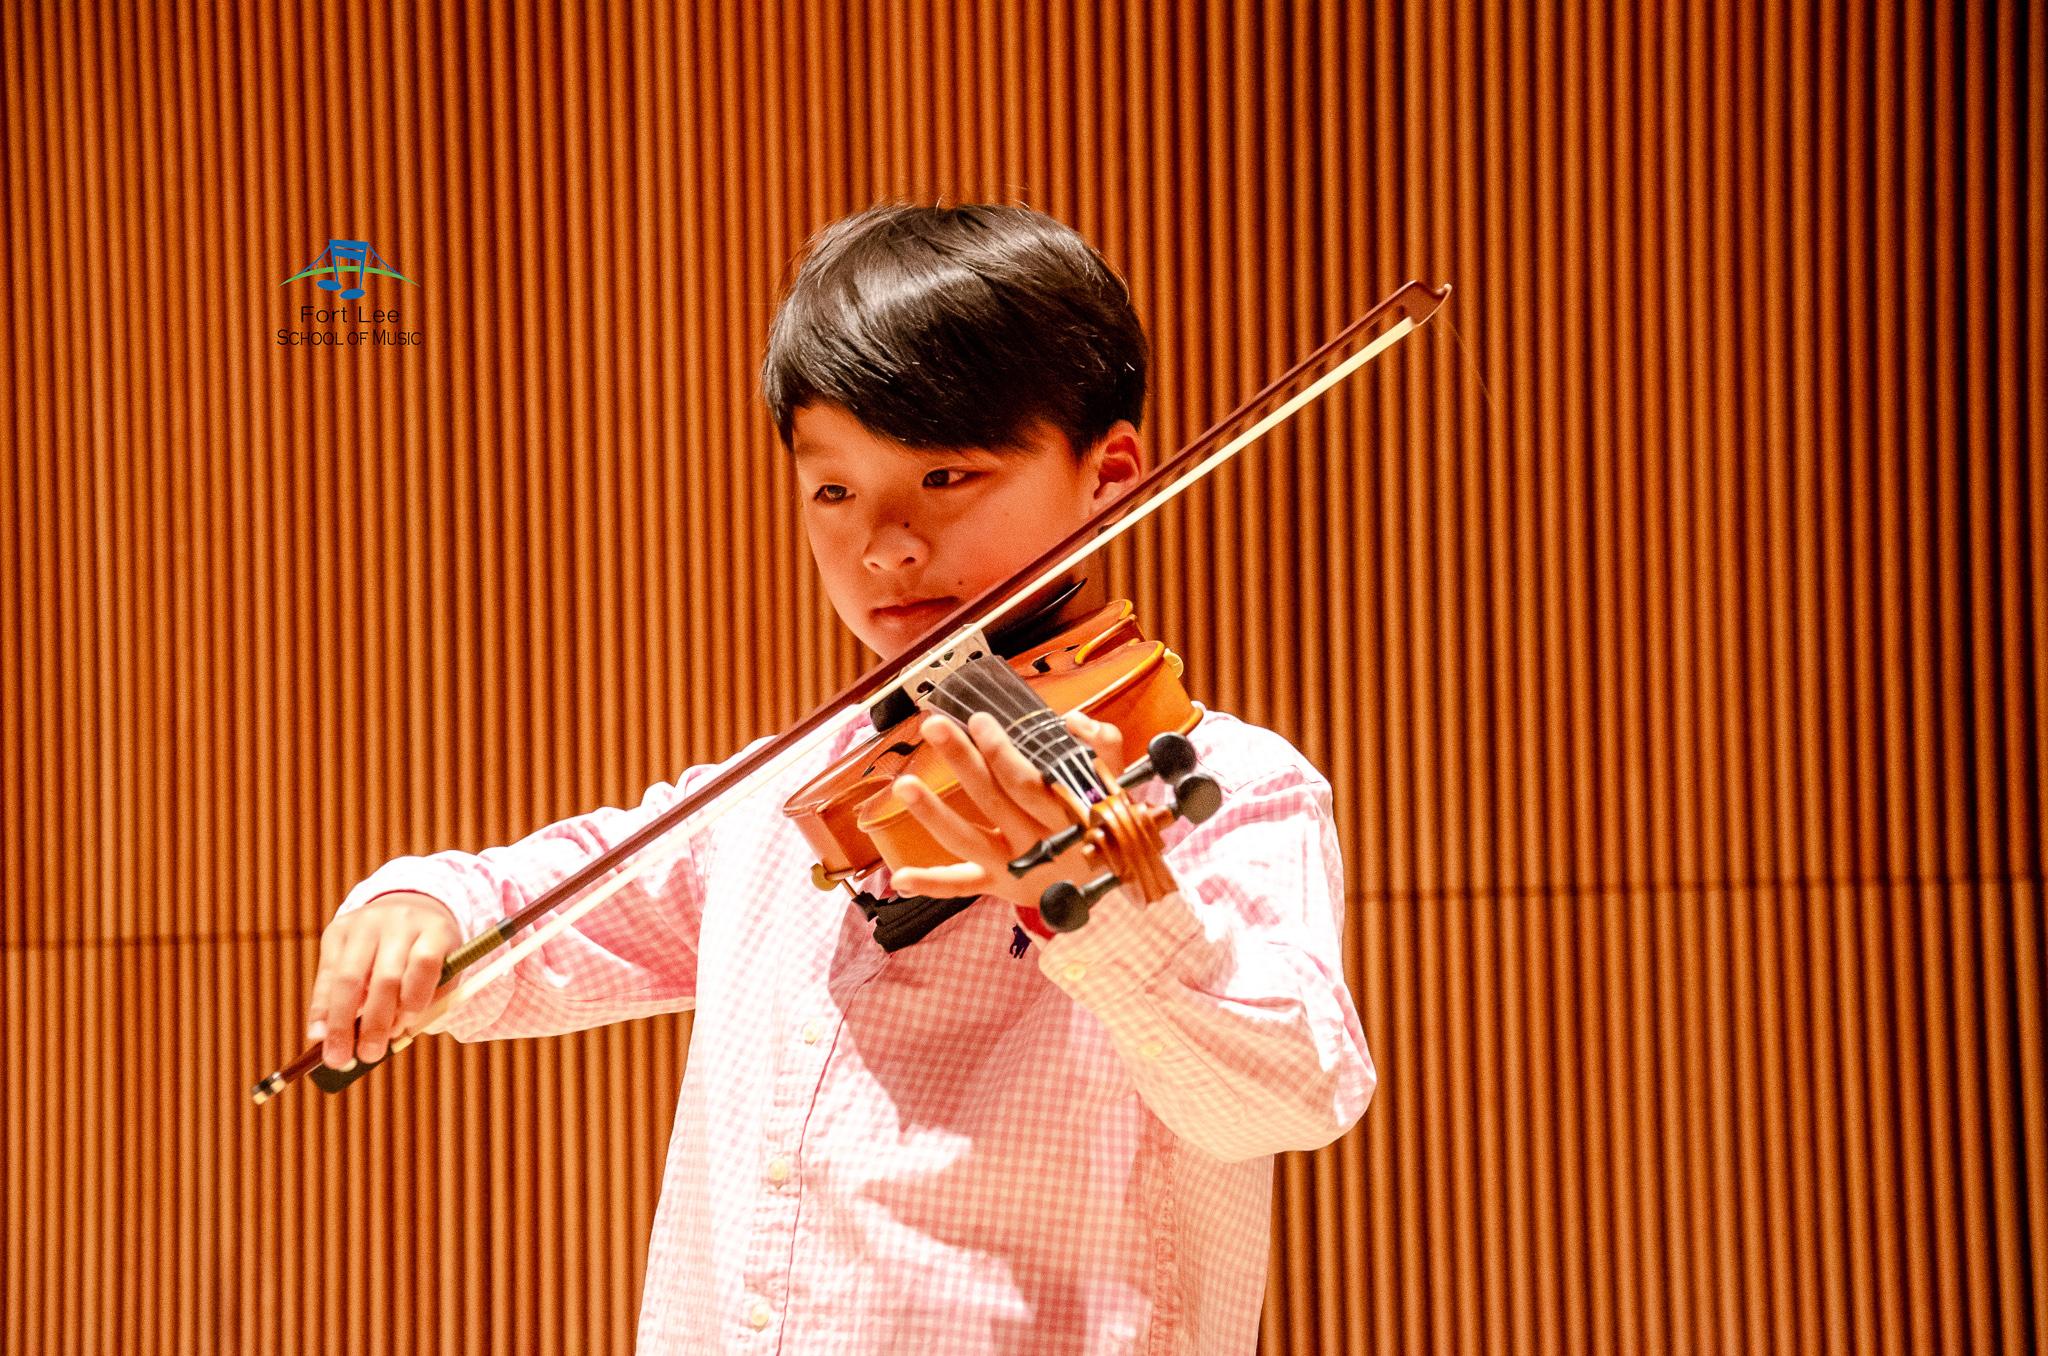 viola-lessons-near-me.jpg